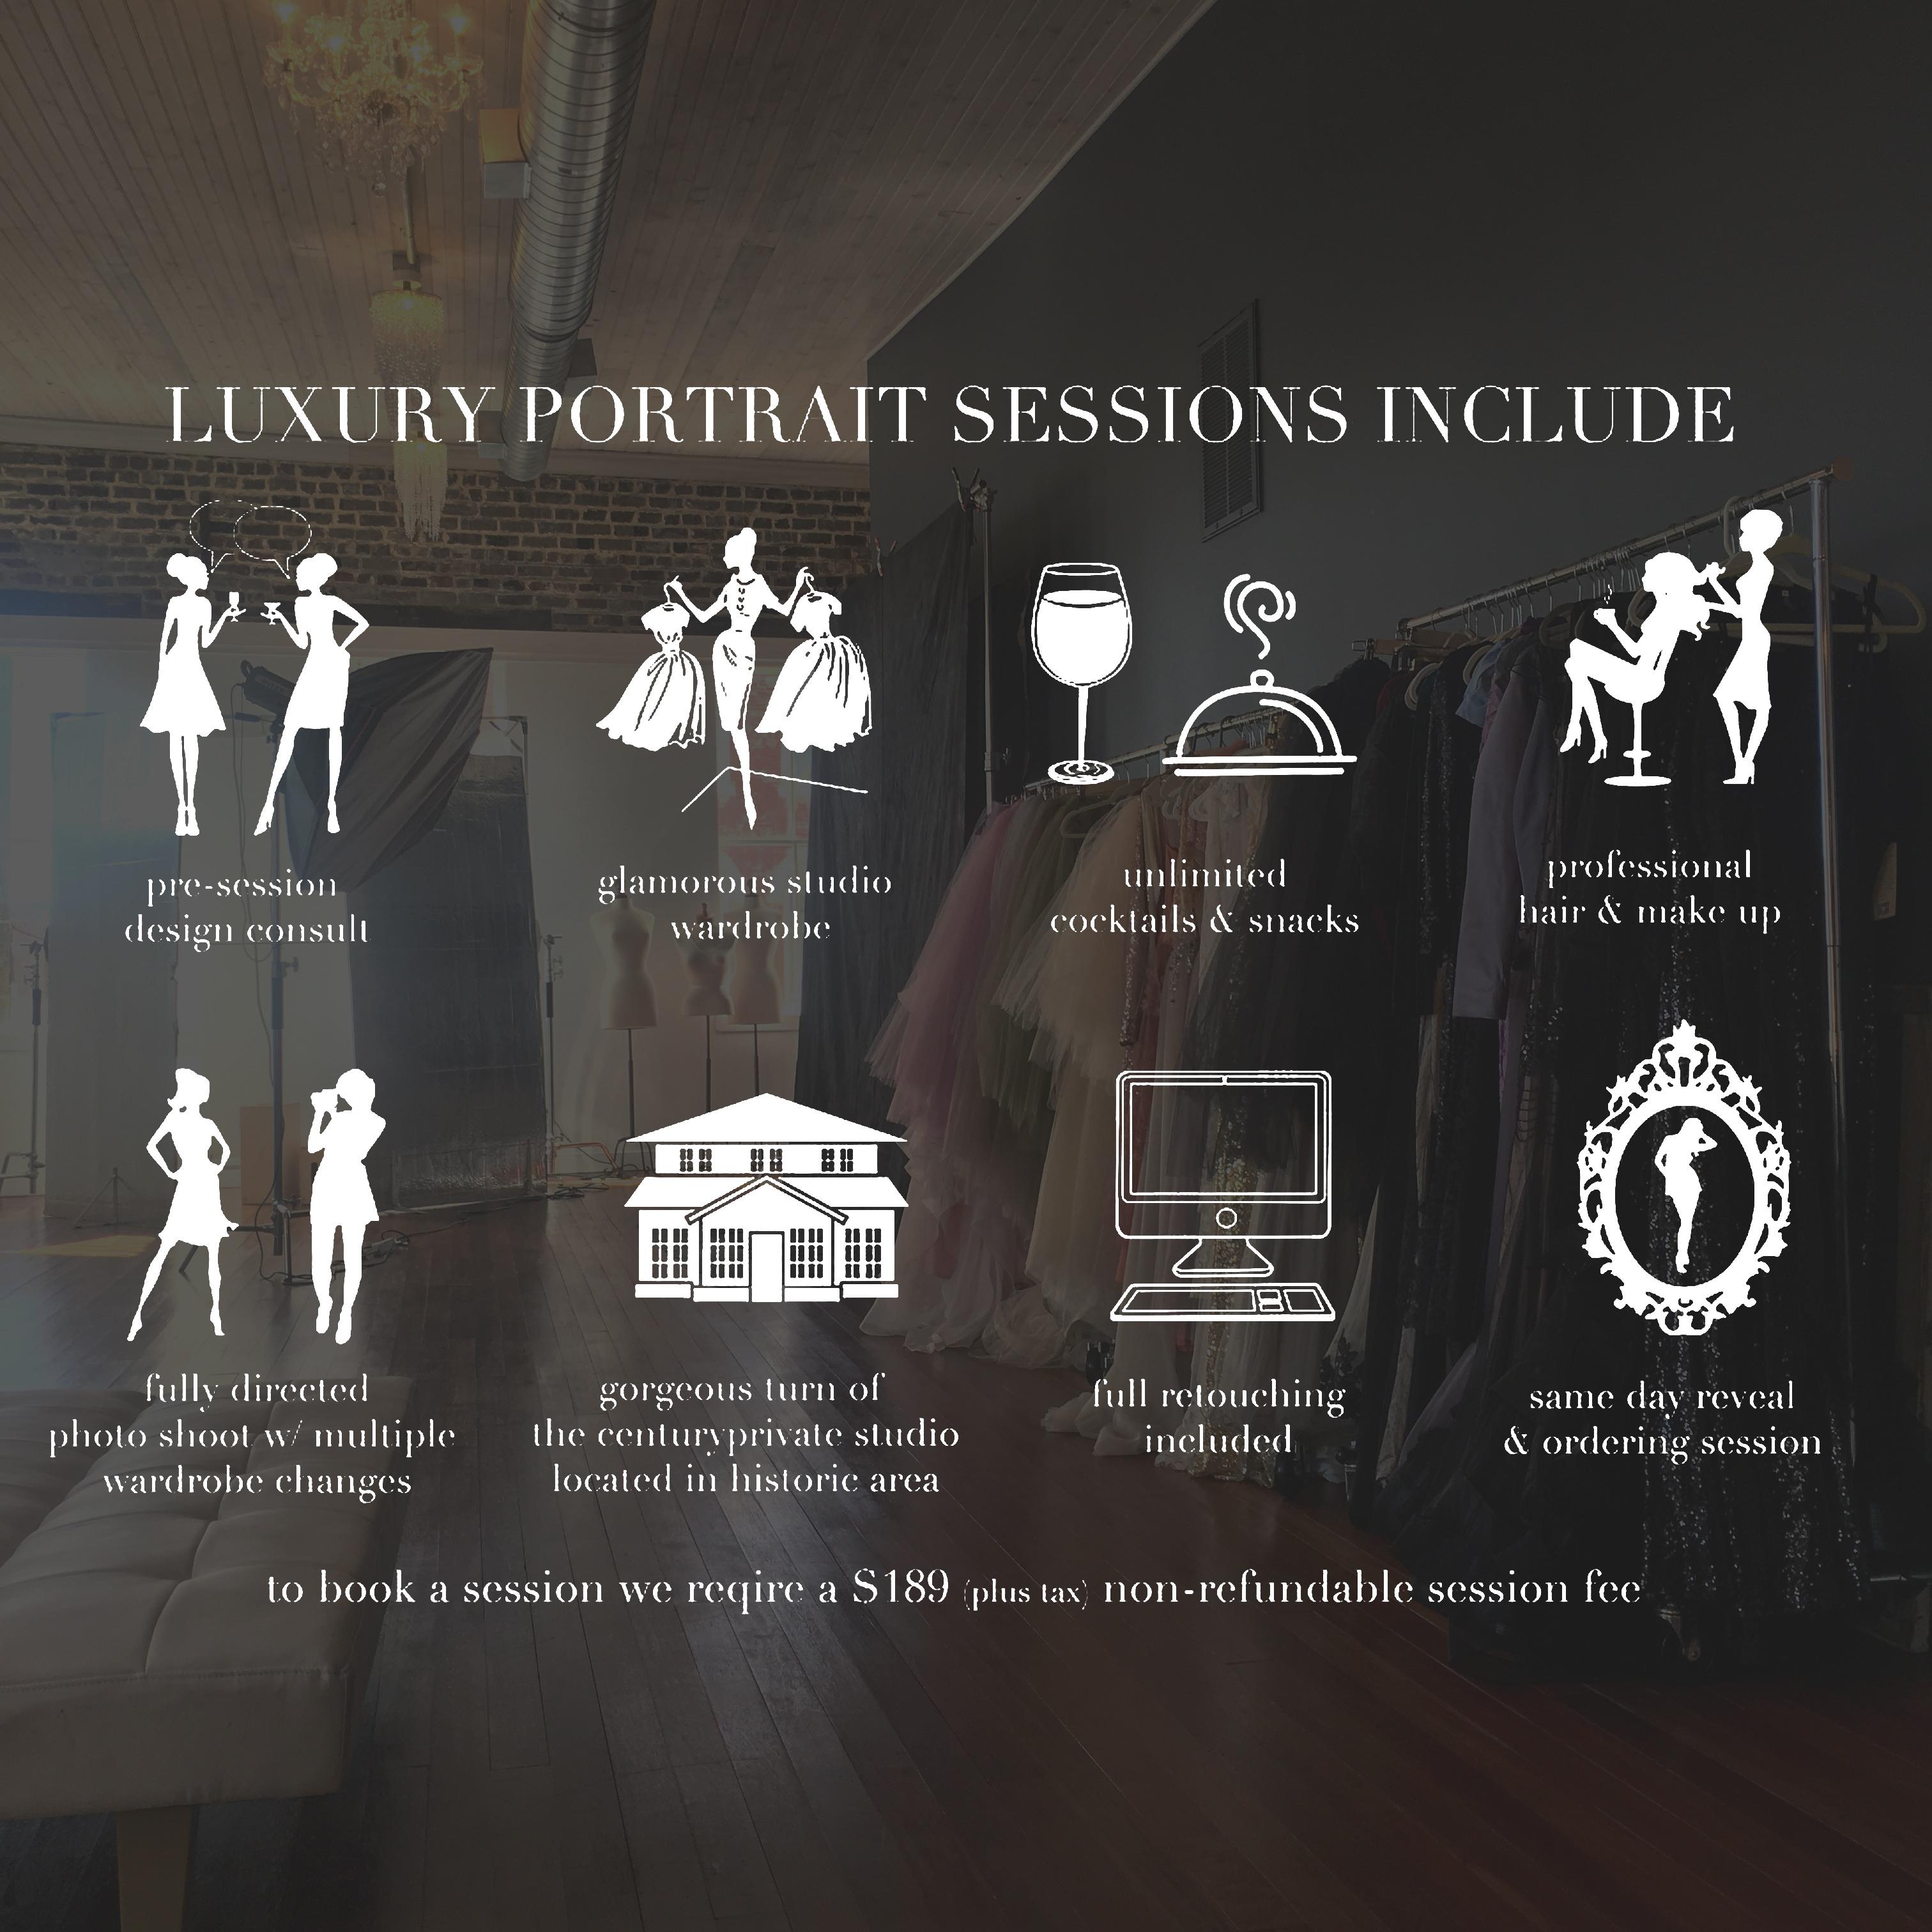 luxurysessionsinclude